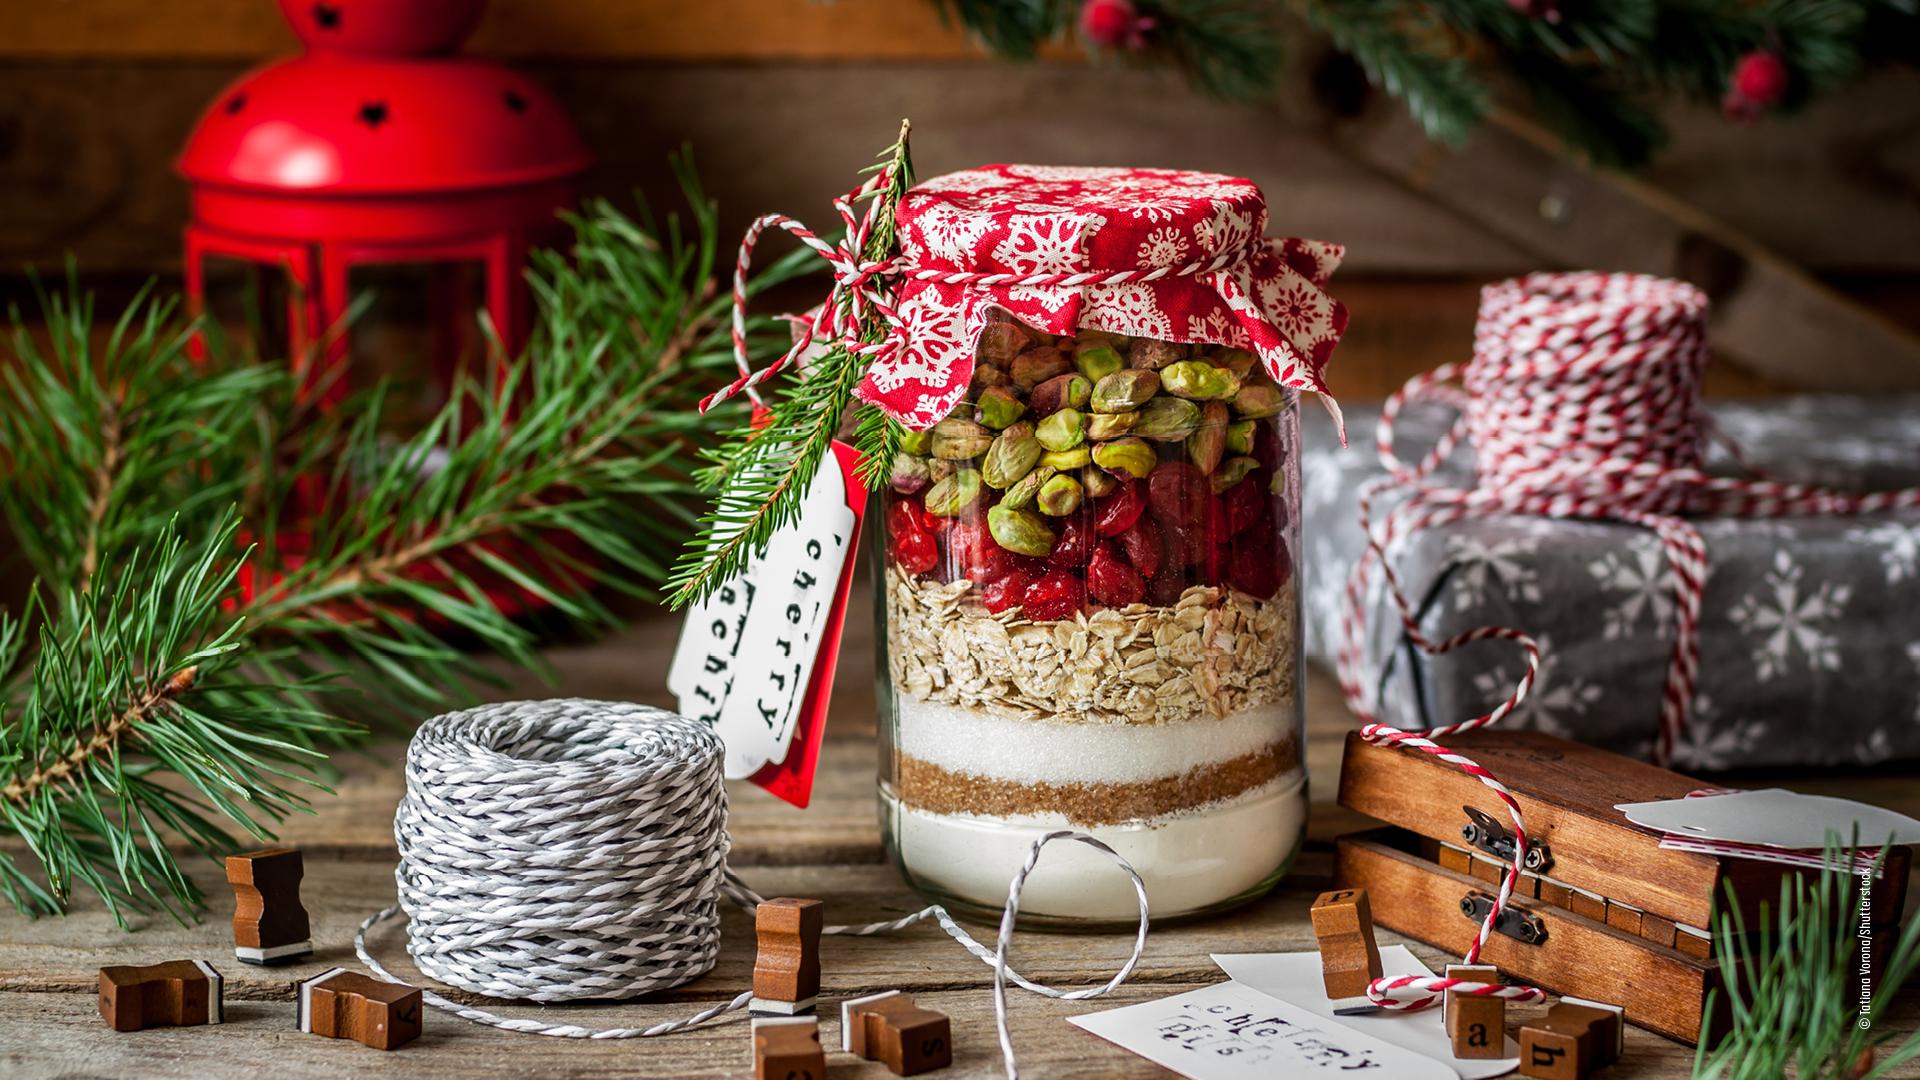 Backmischung_Weihnachtsgeschenke_Querkochen